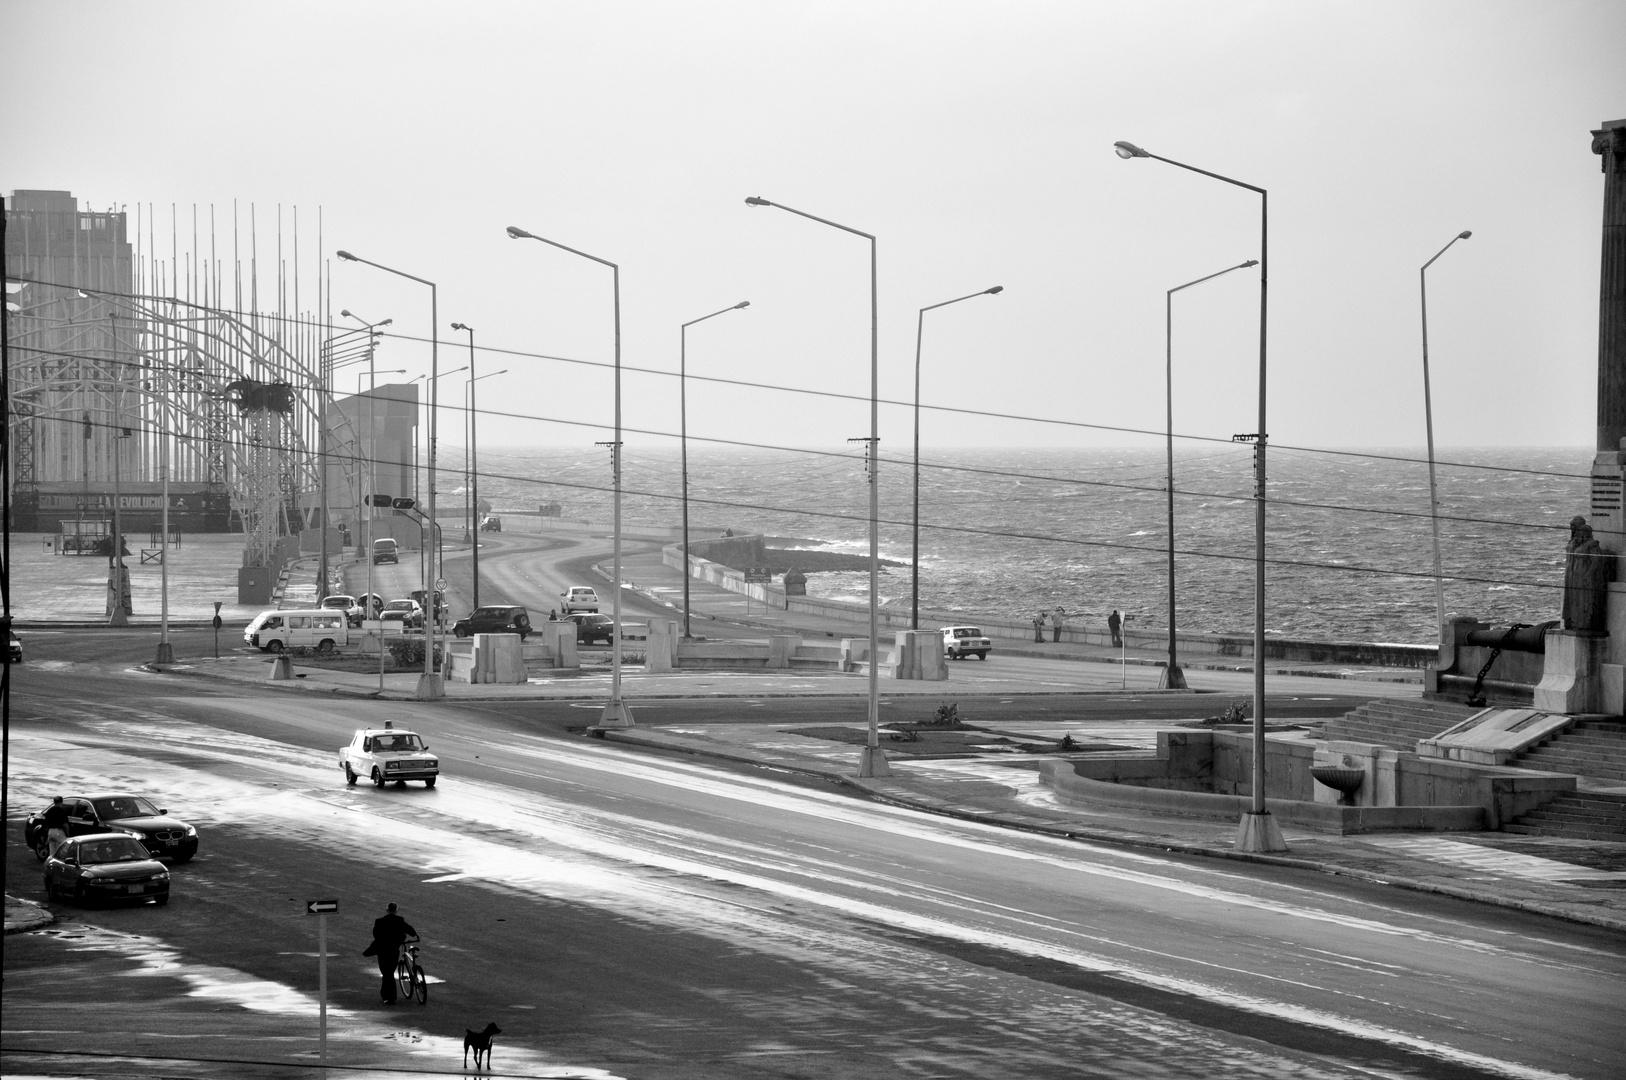 La Habana, Malecón